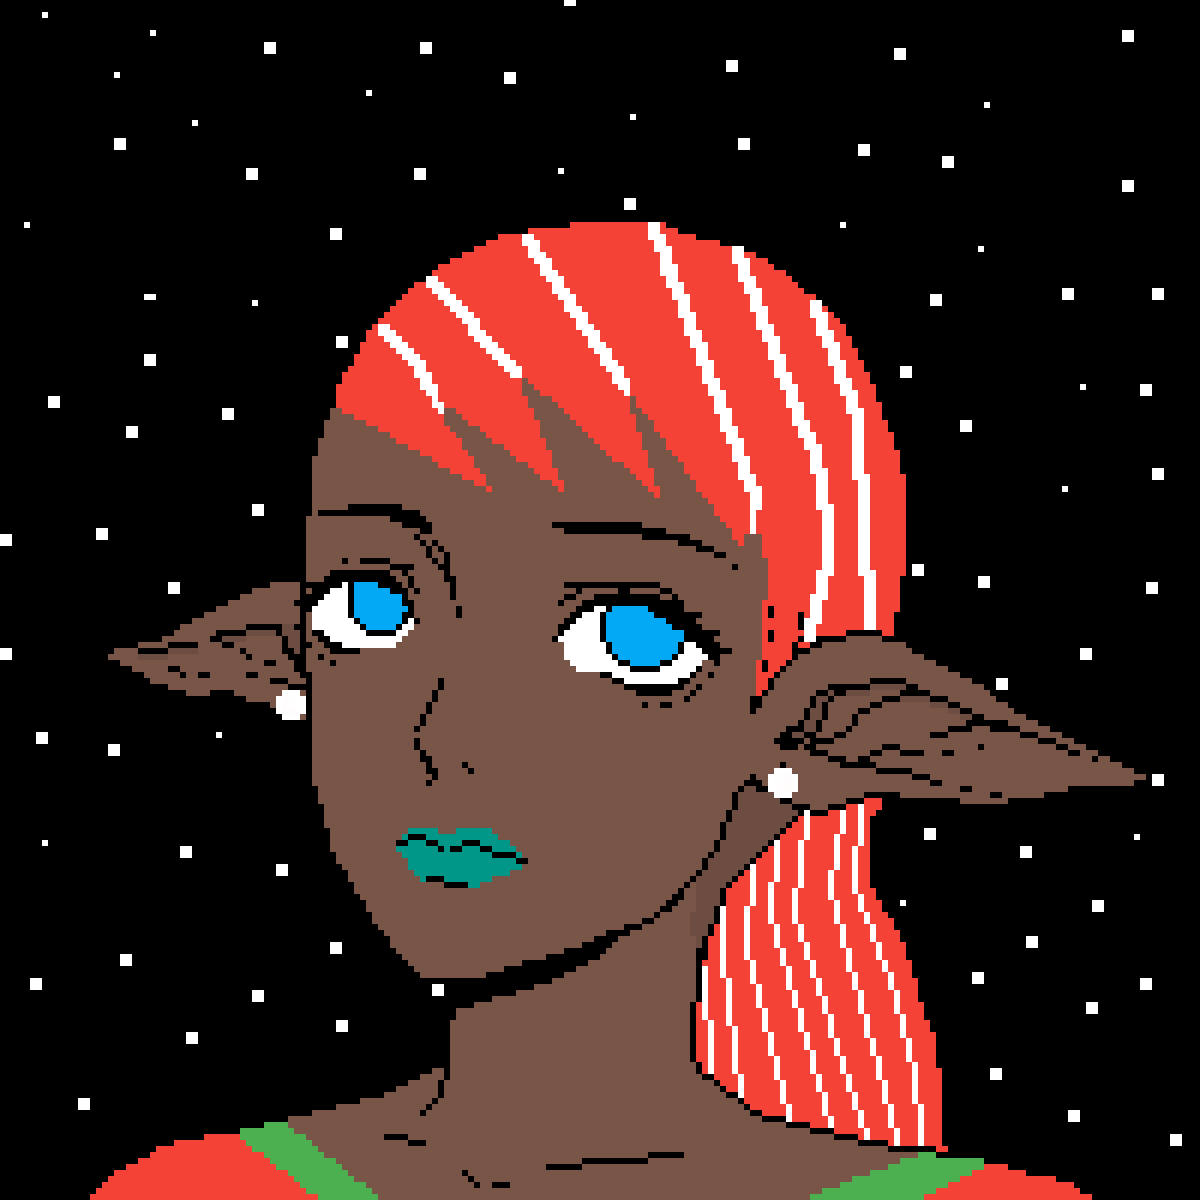 Elf. [Credit to Tsiox} by lillepa72